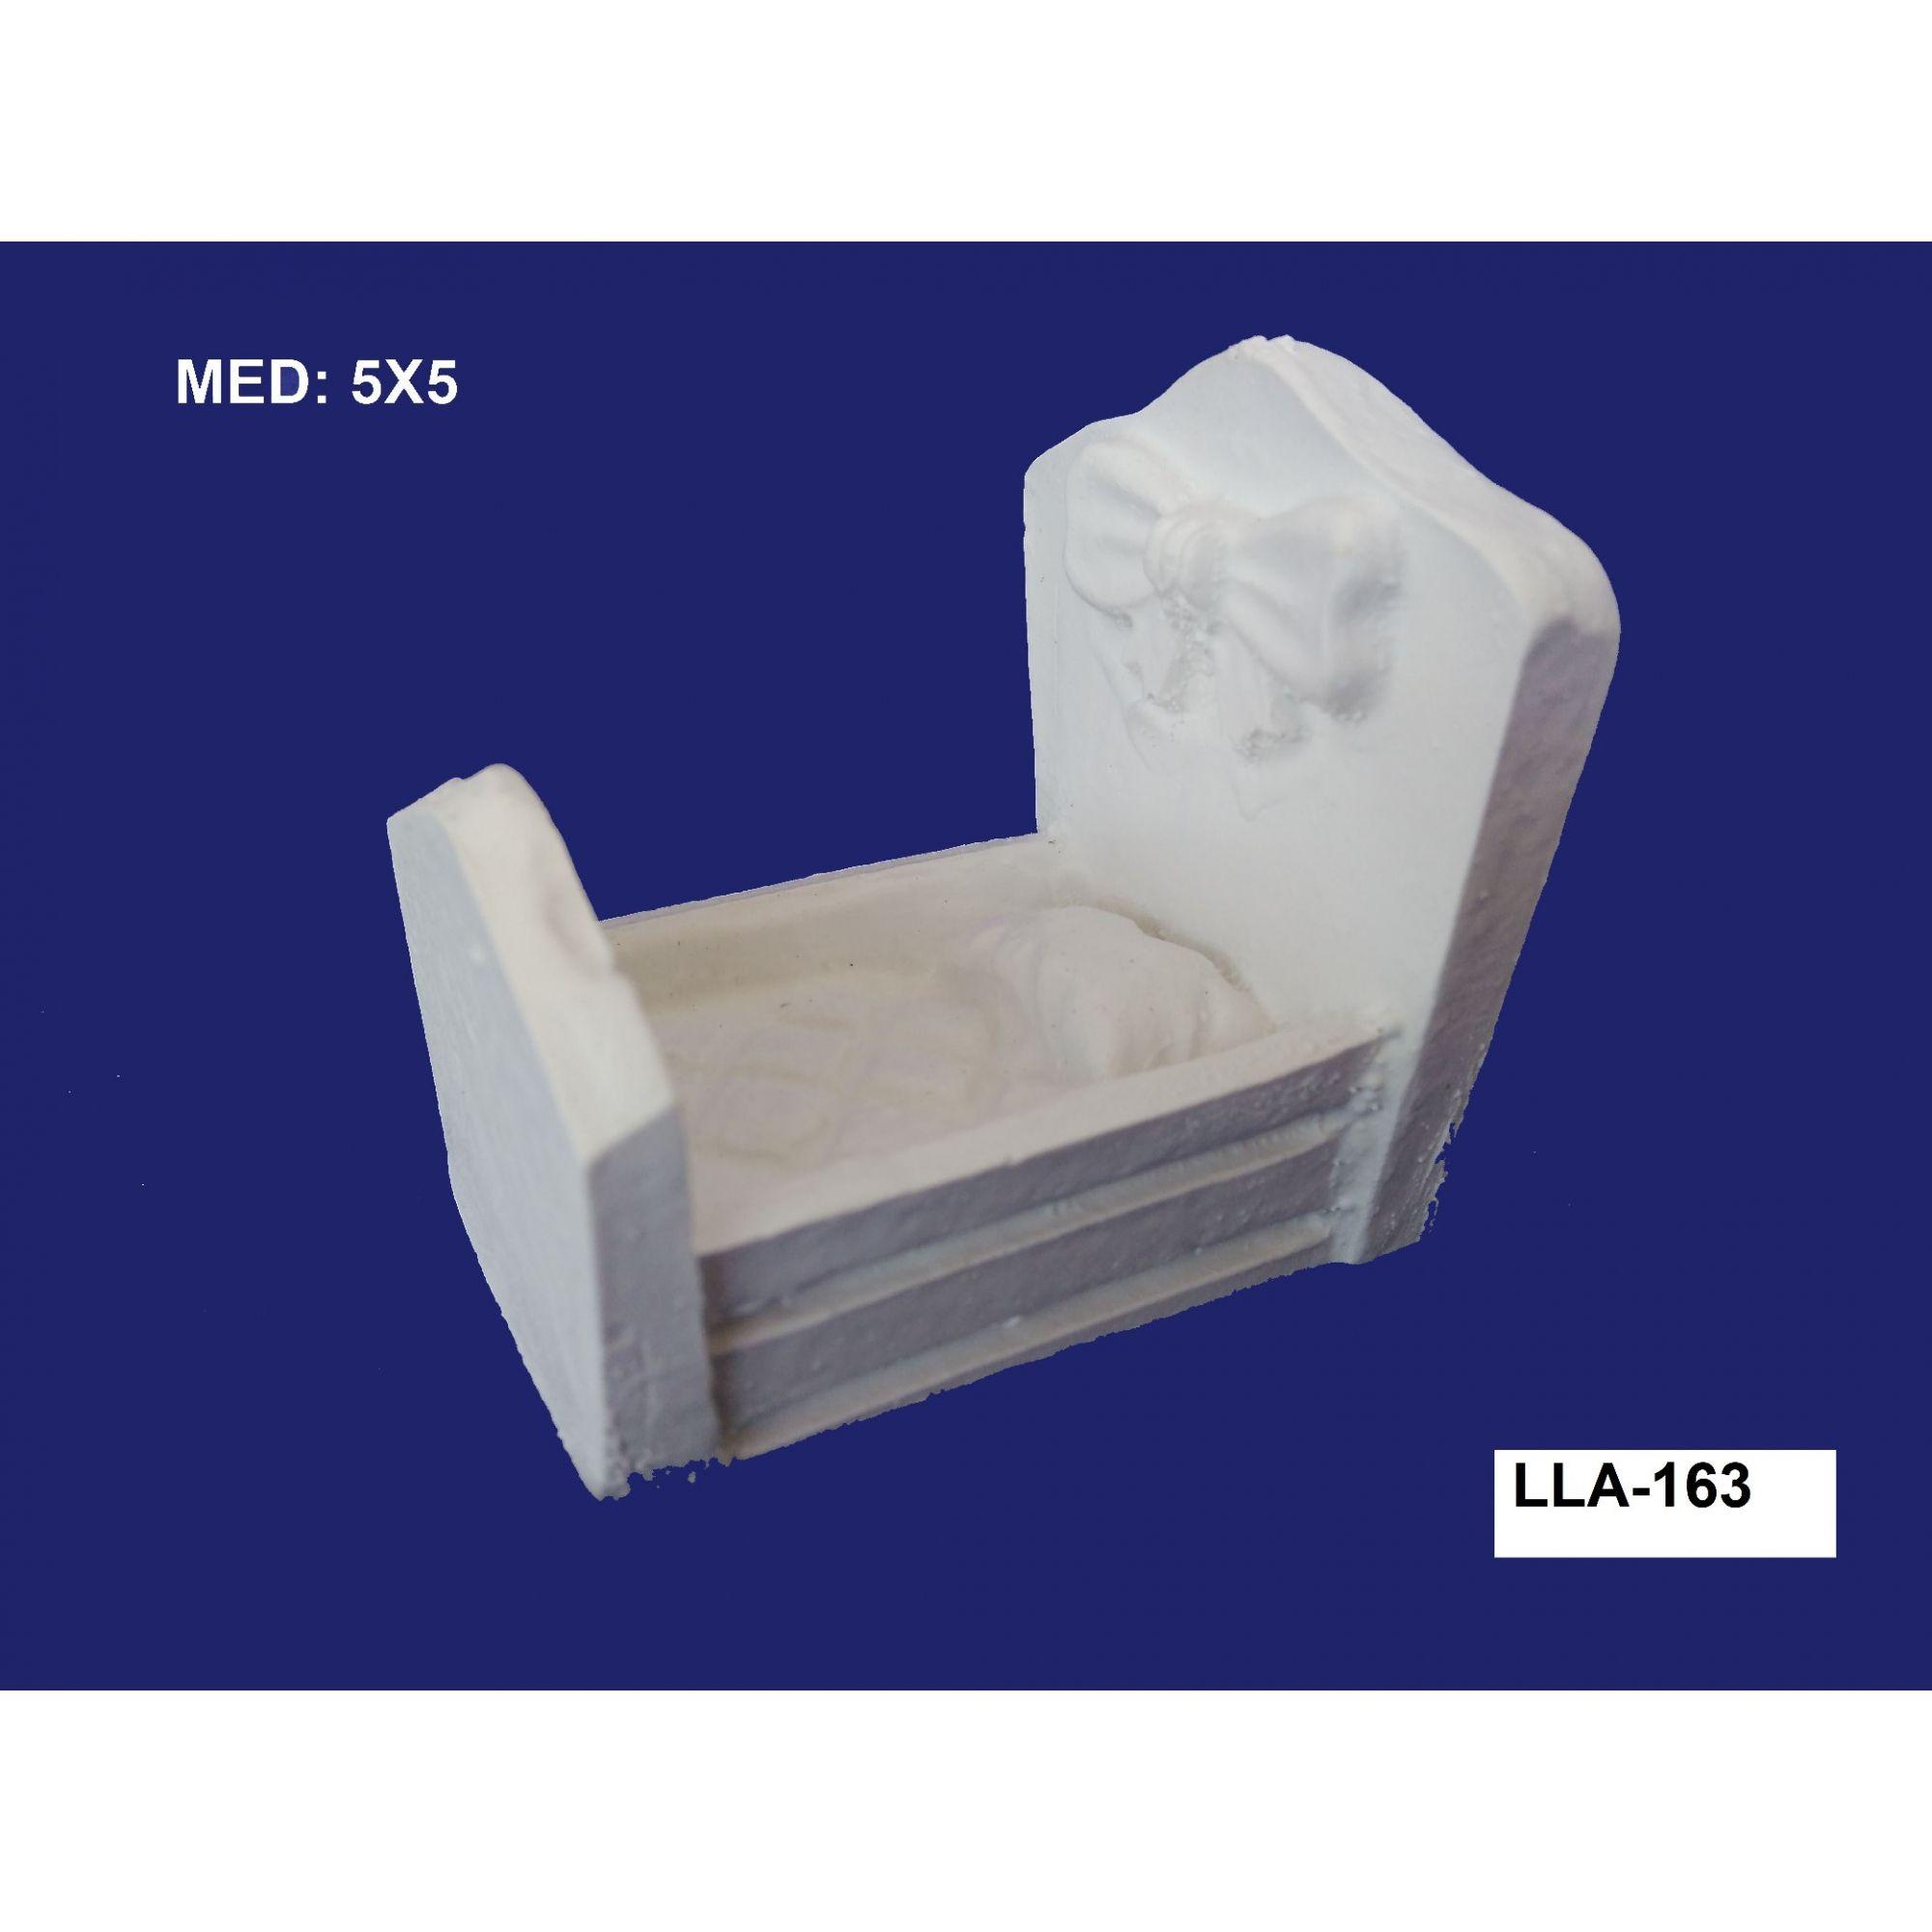 LLA-163 BERÇO 3D 05X05CM